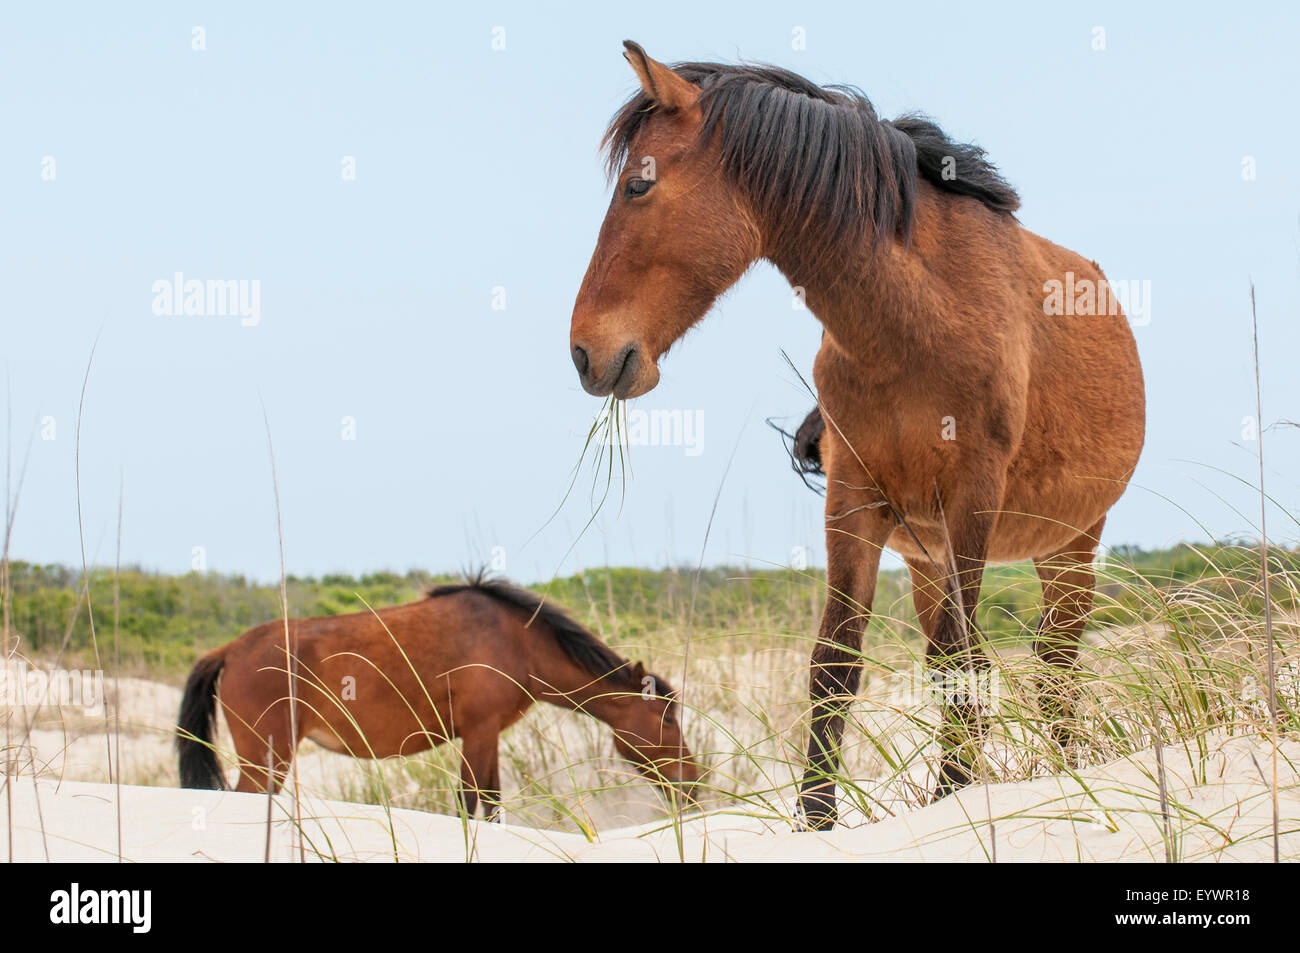 Wild mustangs (Equus ferus caballus), Currituck National Wildlife Refuge, Corolla, Outer Banks, North Carolina, - Stock Image